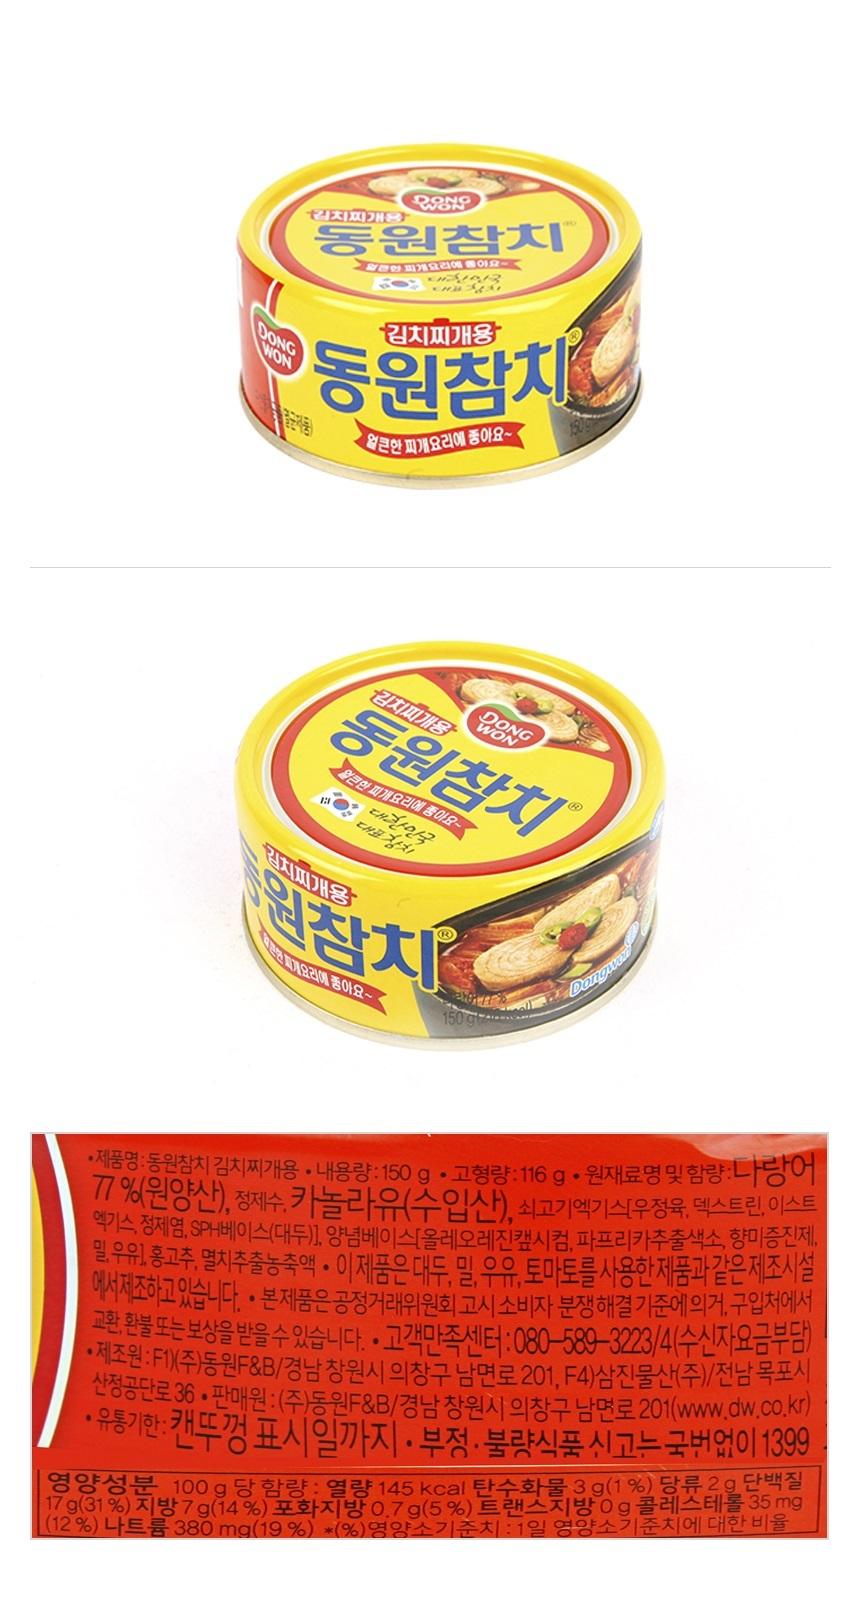 [ DongWonF&B ] Spicy Light Tuna For Kimchi Stew 150G X 2